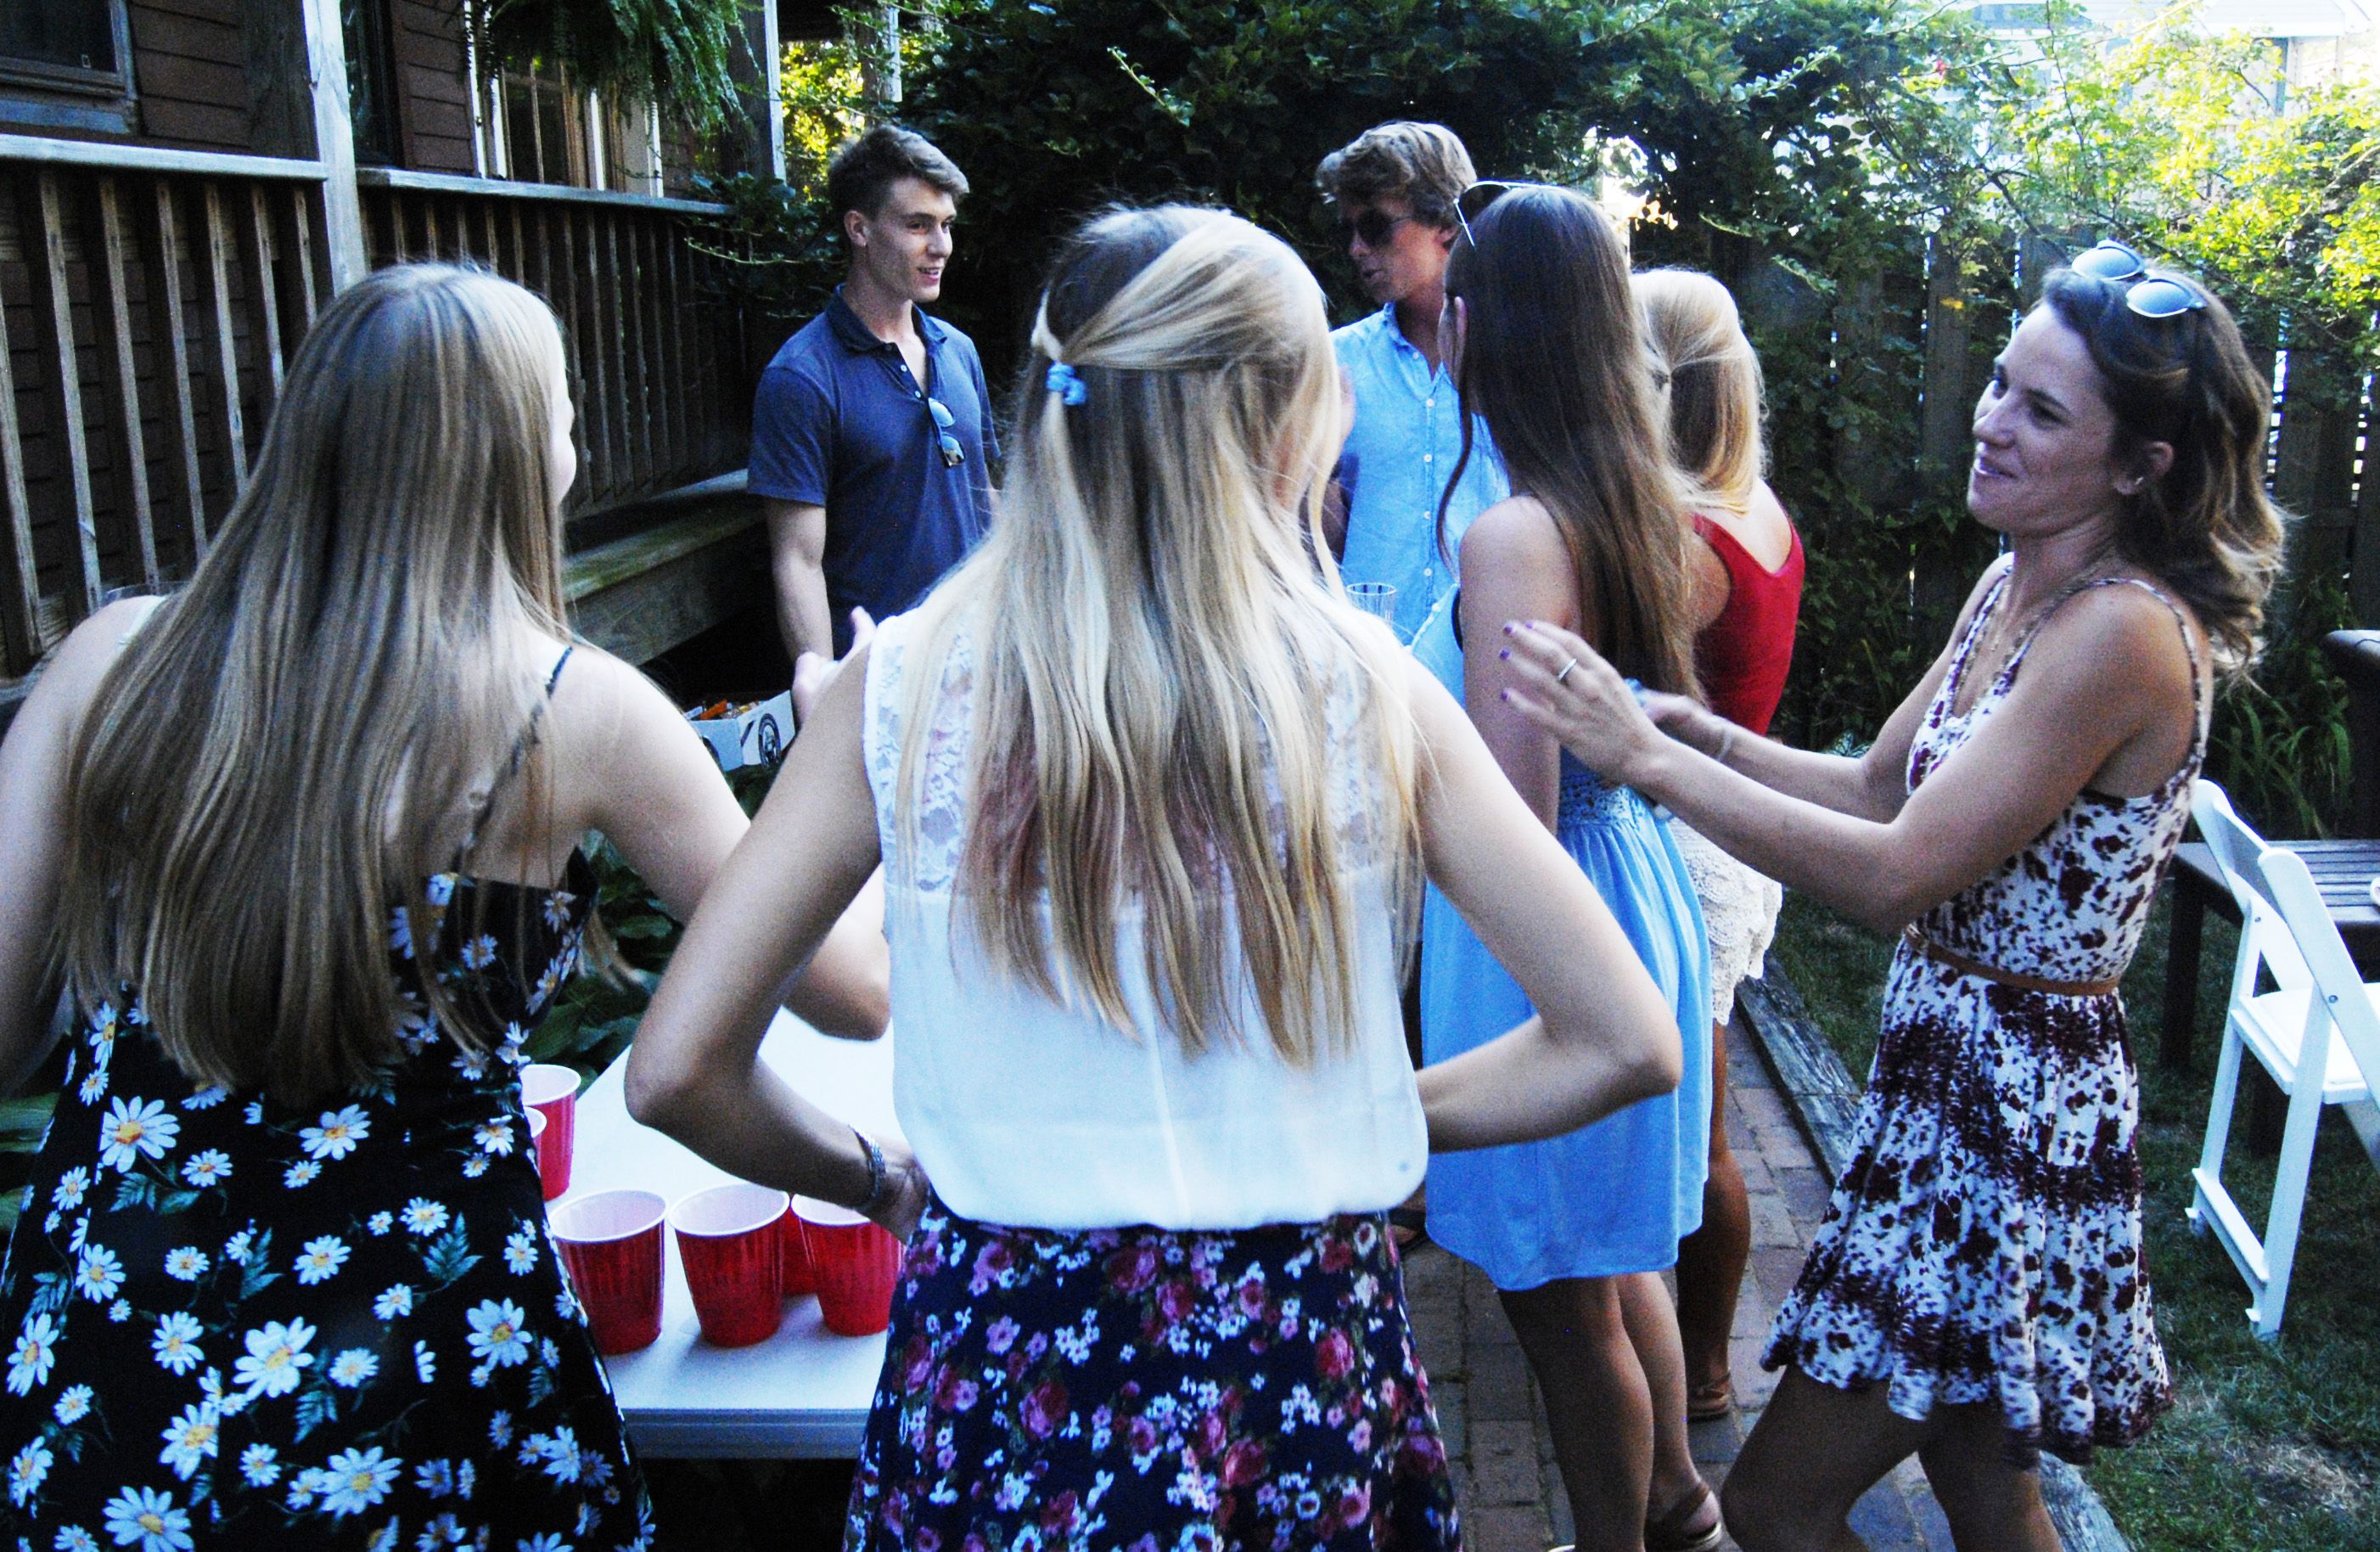 Beer pong players, Luke, Will, Hannah